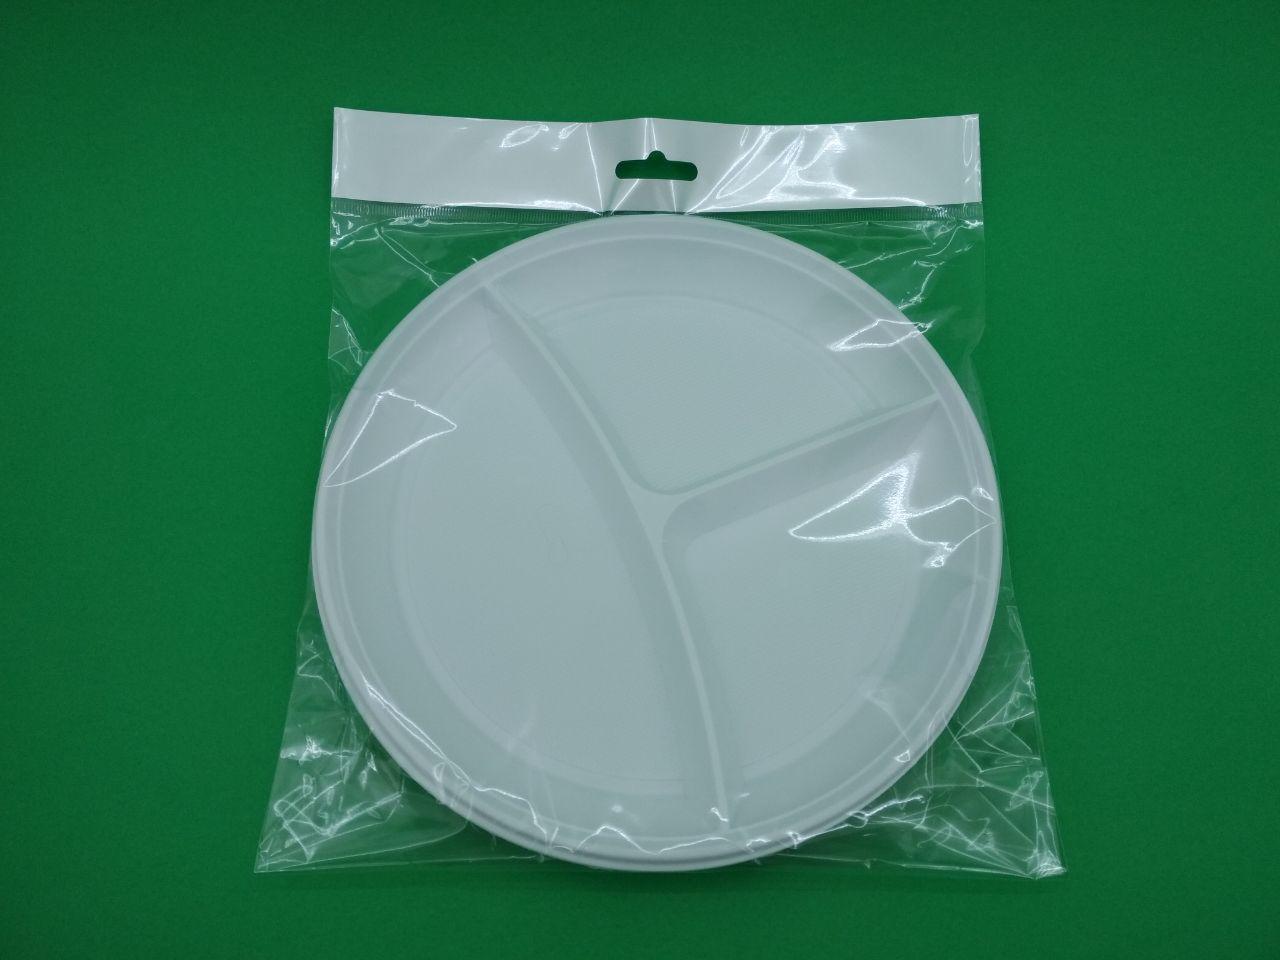 Тарелка одноразовая 3-х секционная 205мм набор, 10шт\пач